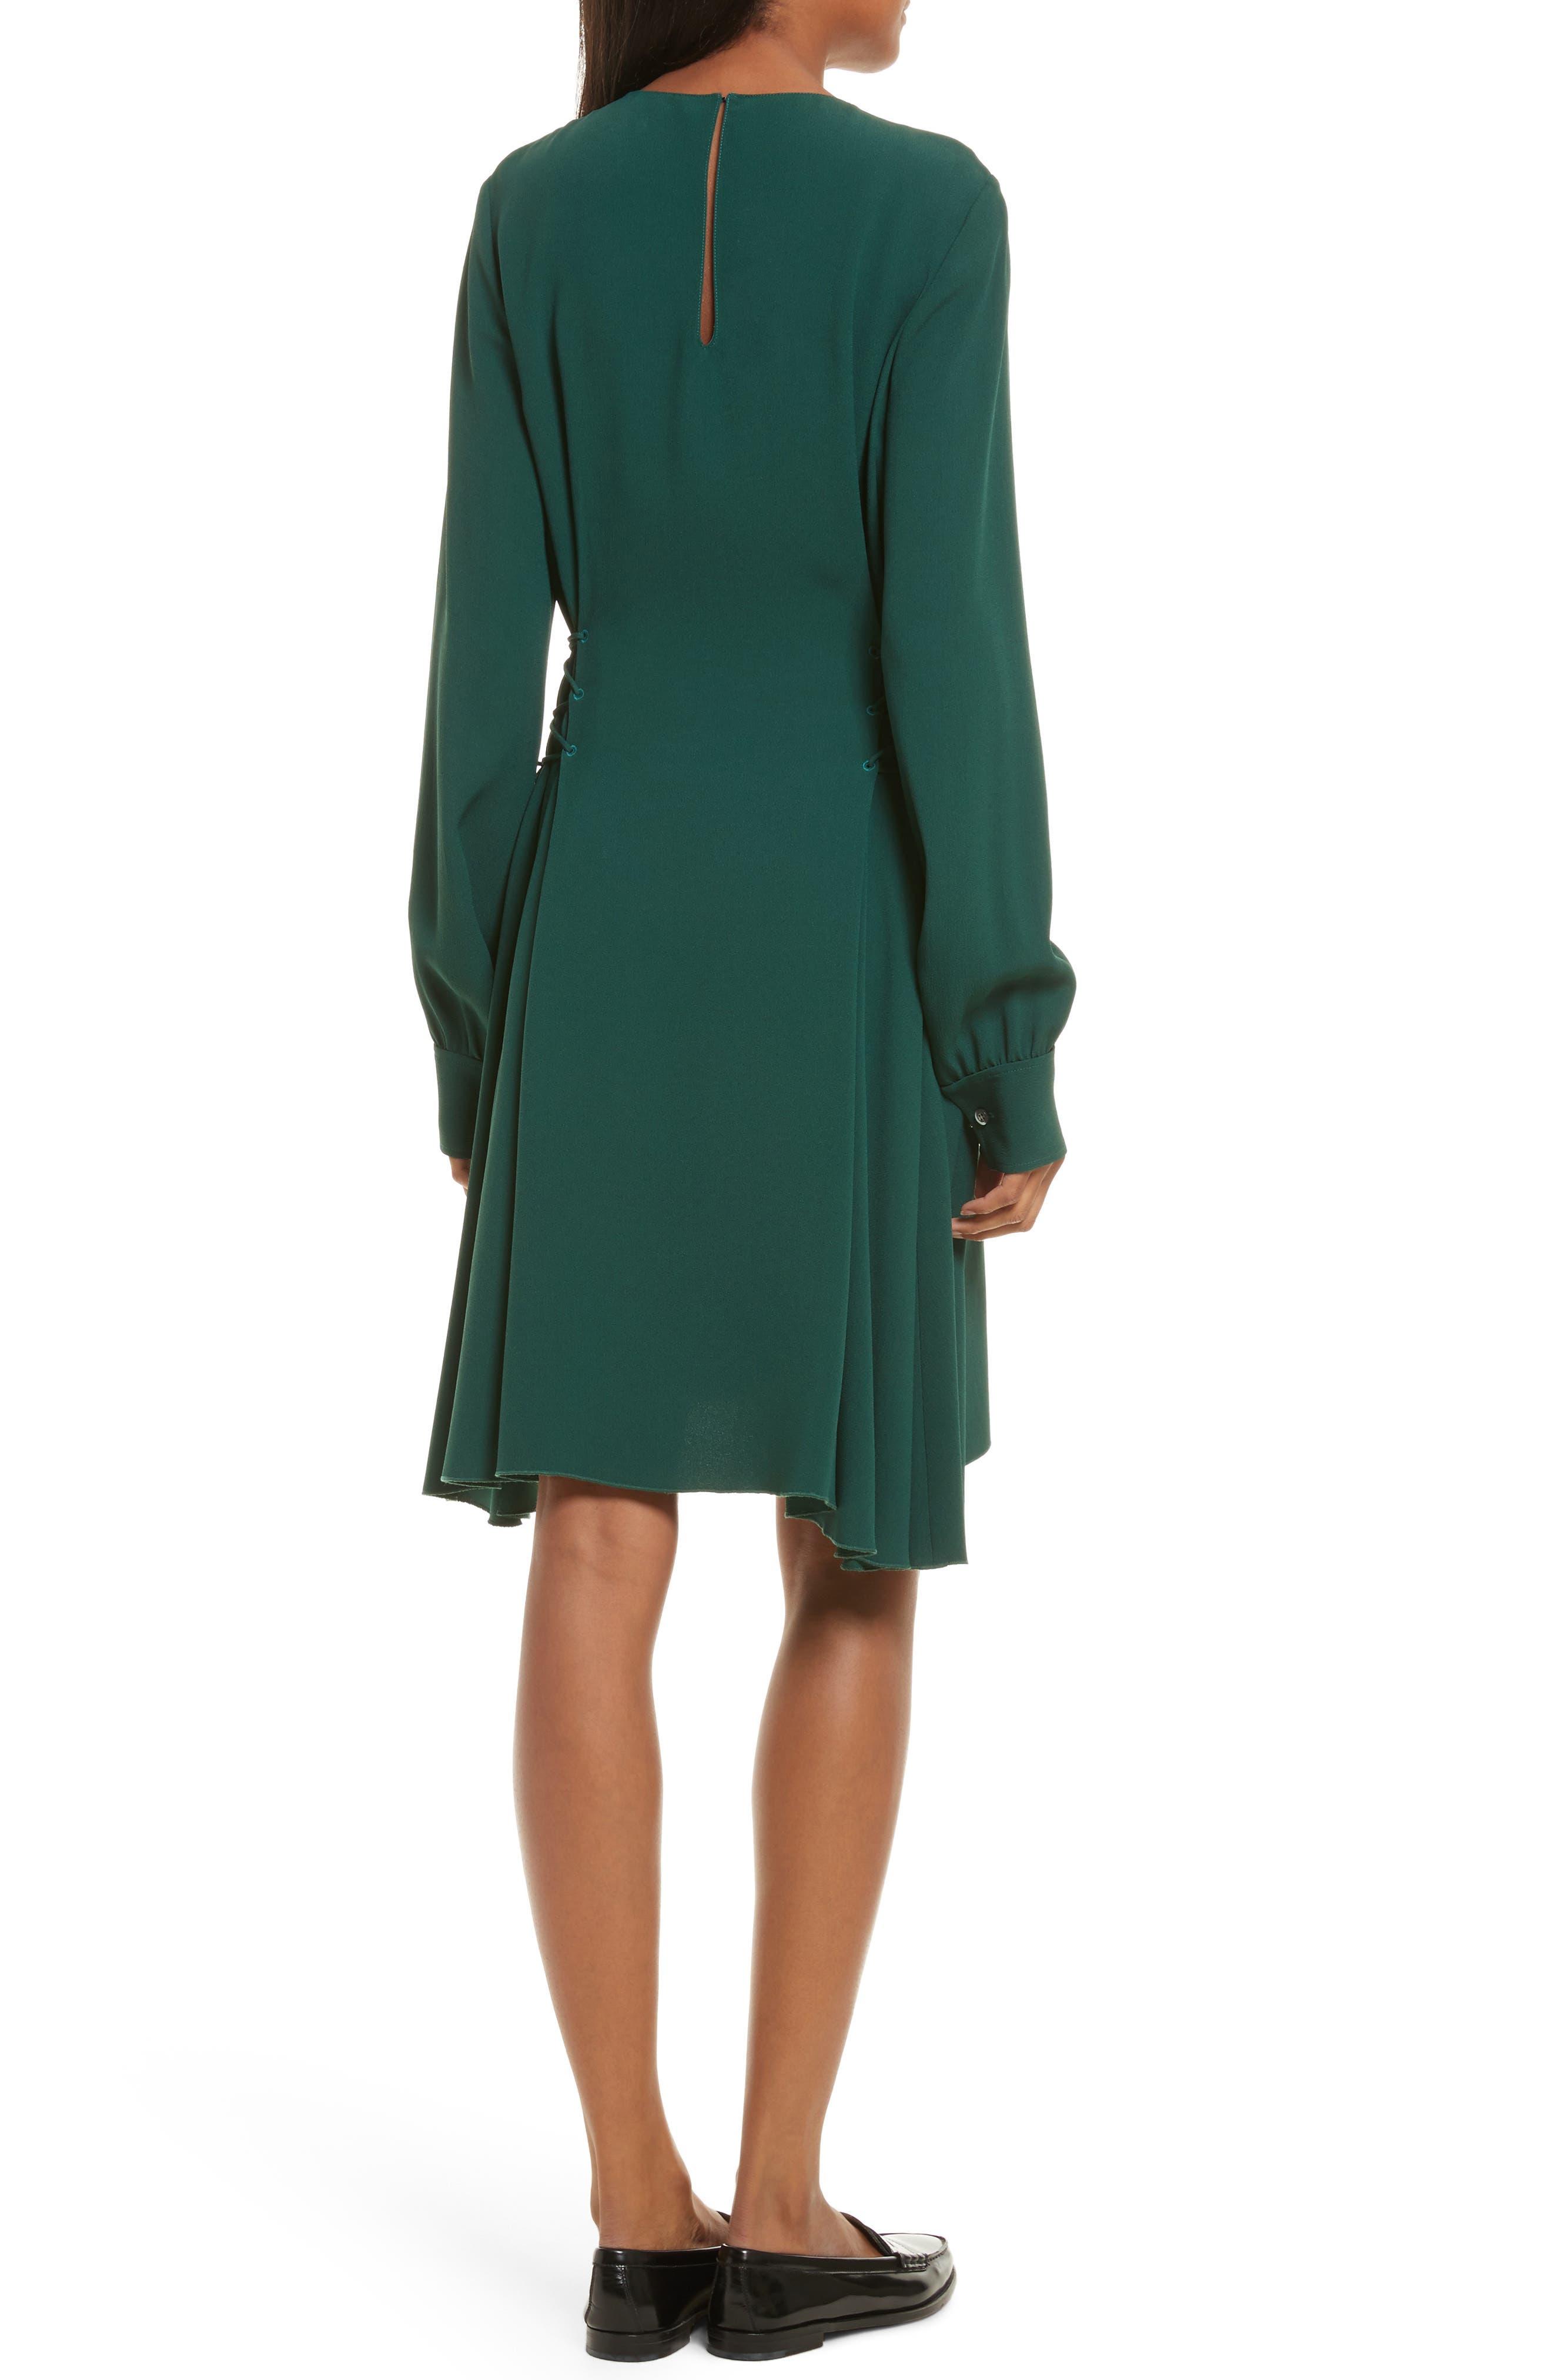 Kensington Lace-Up A-Line Dress,                             Alternate thumbnail 2, color,                             Bright Hunter